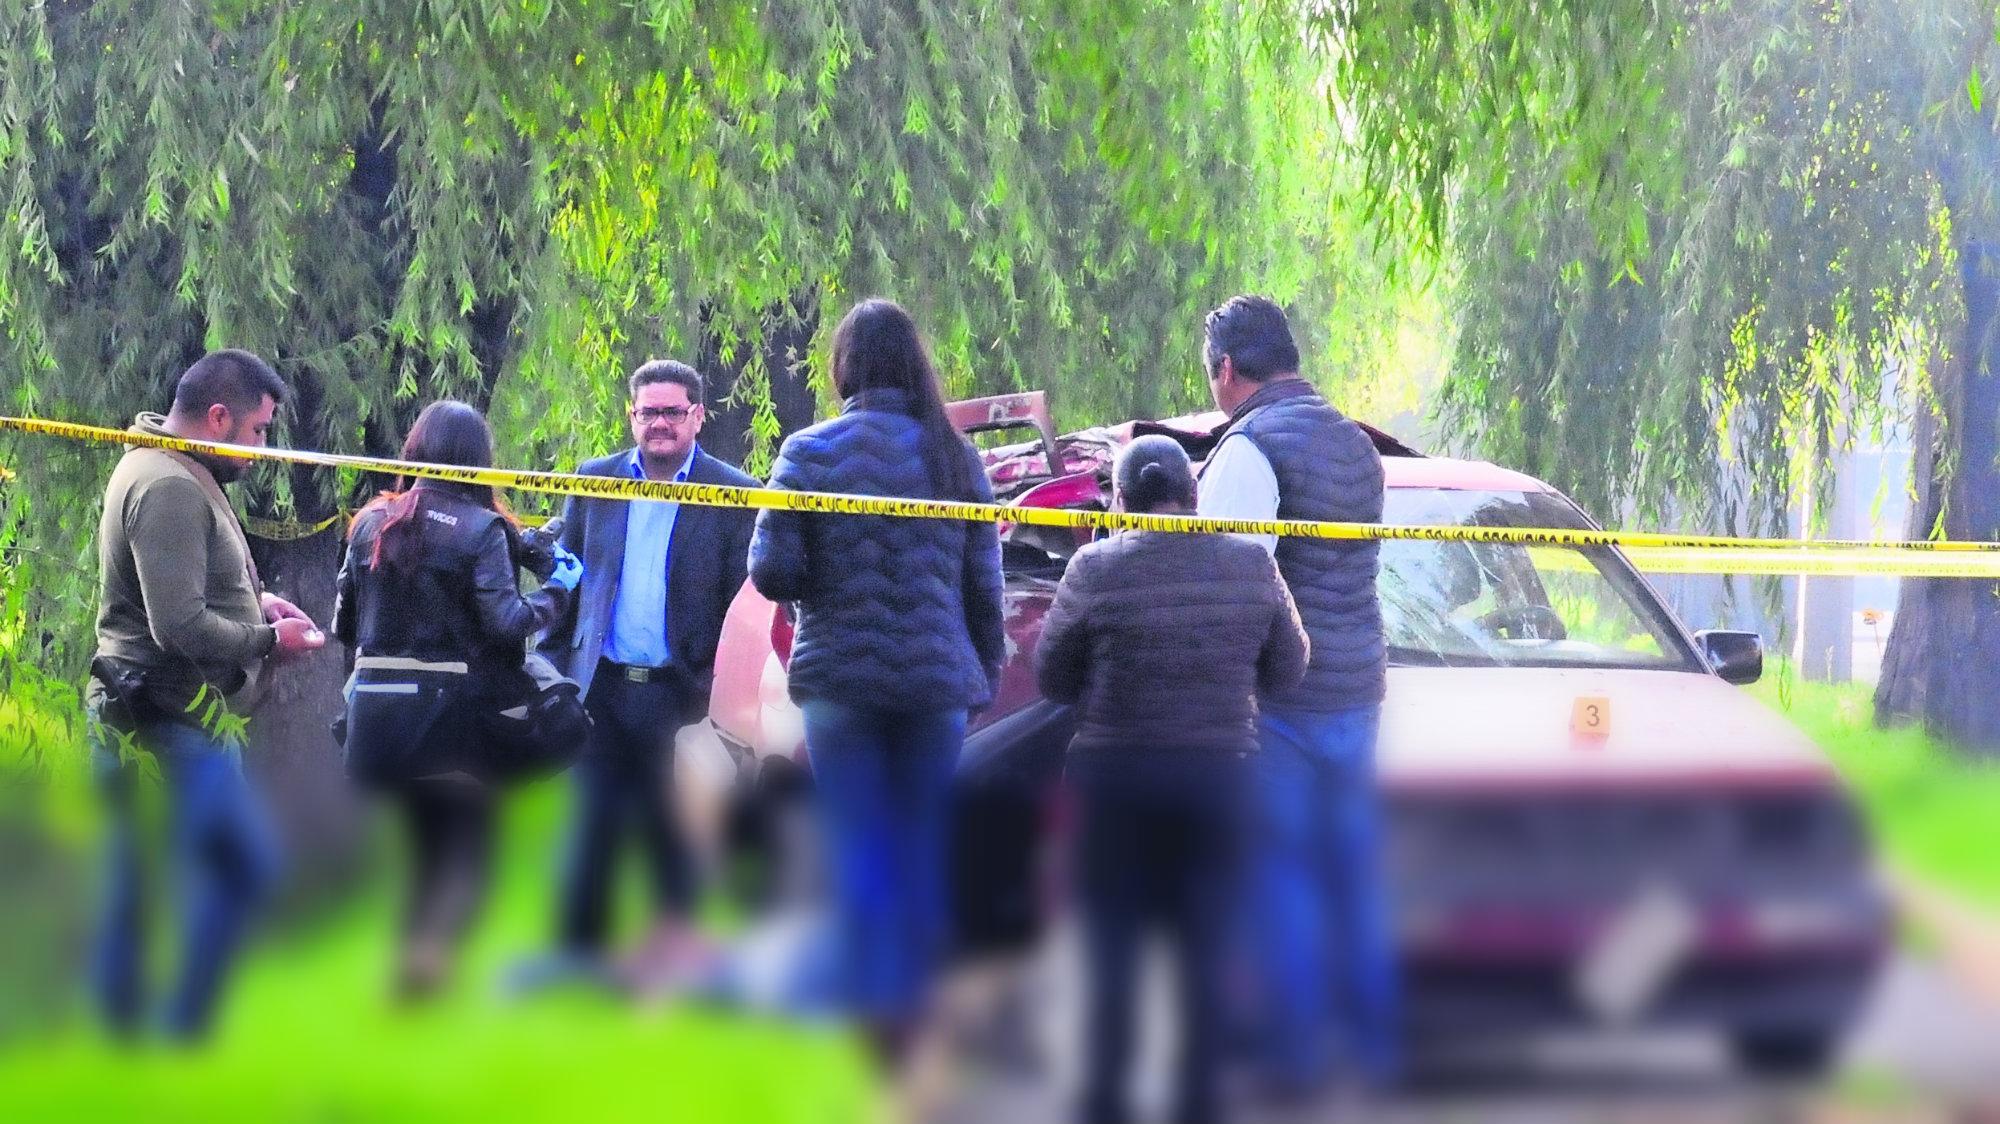 Pareja se impacta contra árbol en San Mateo Atenco ella murió y él sobrevivió